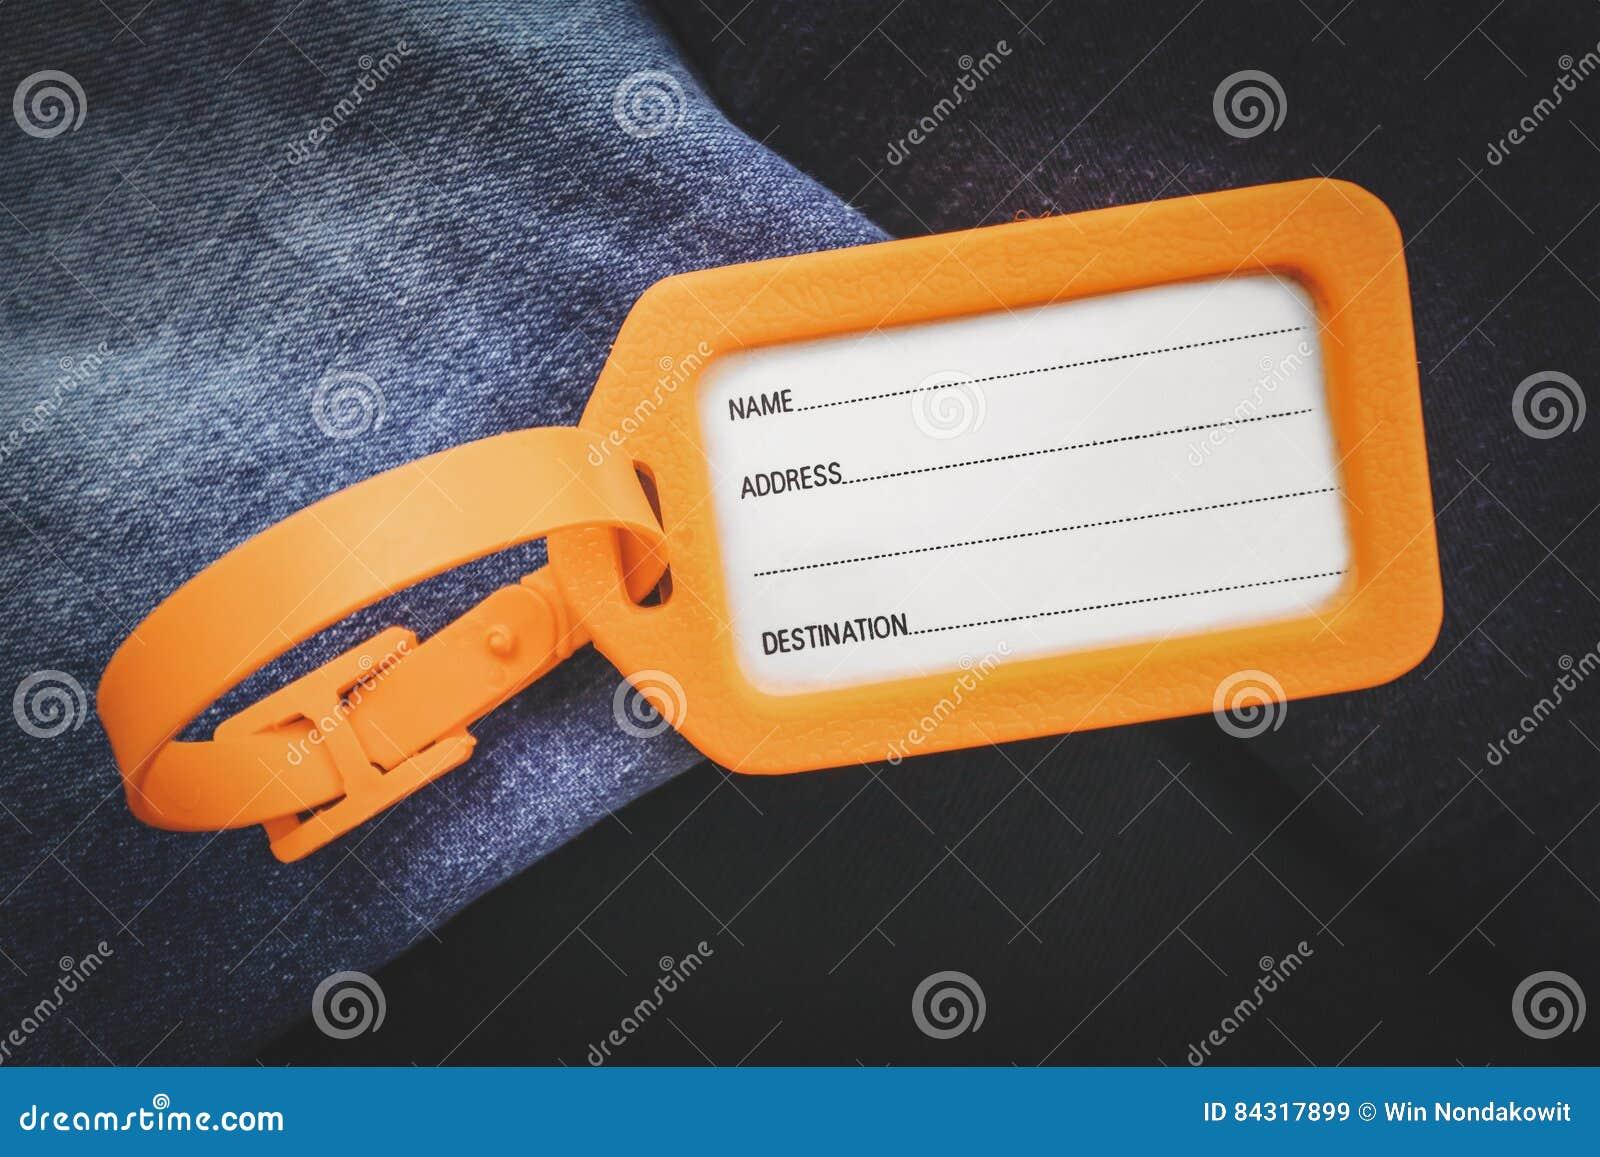 3e6e11425543 Luggage tag label stock image. Image of address, sign - 84317899